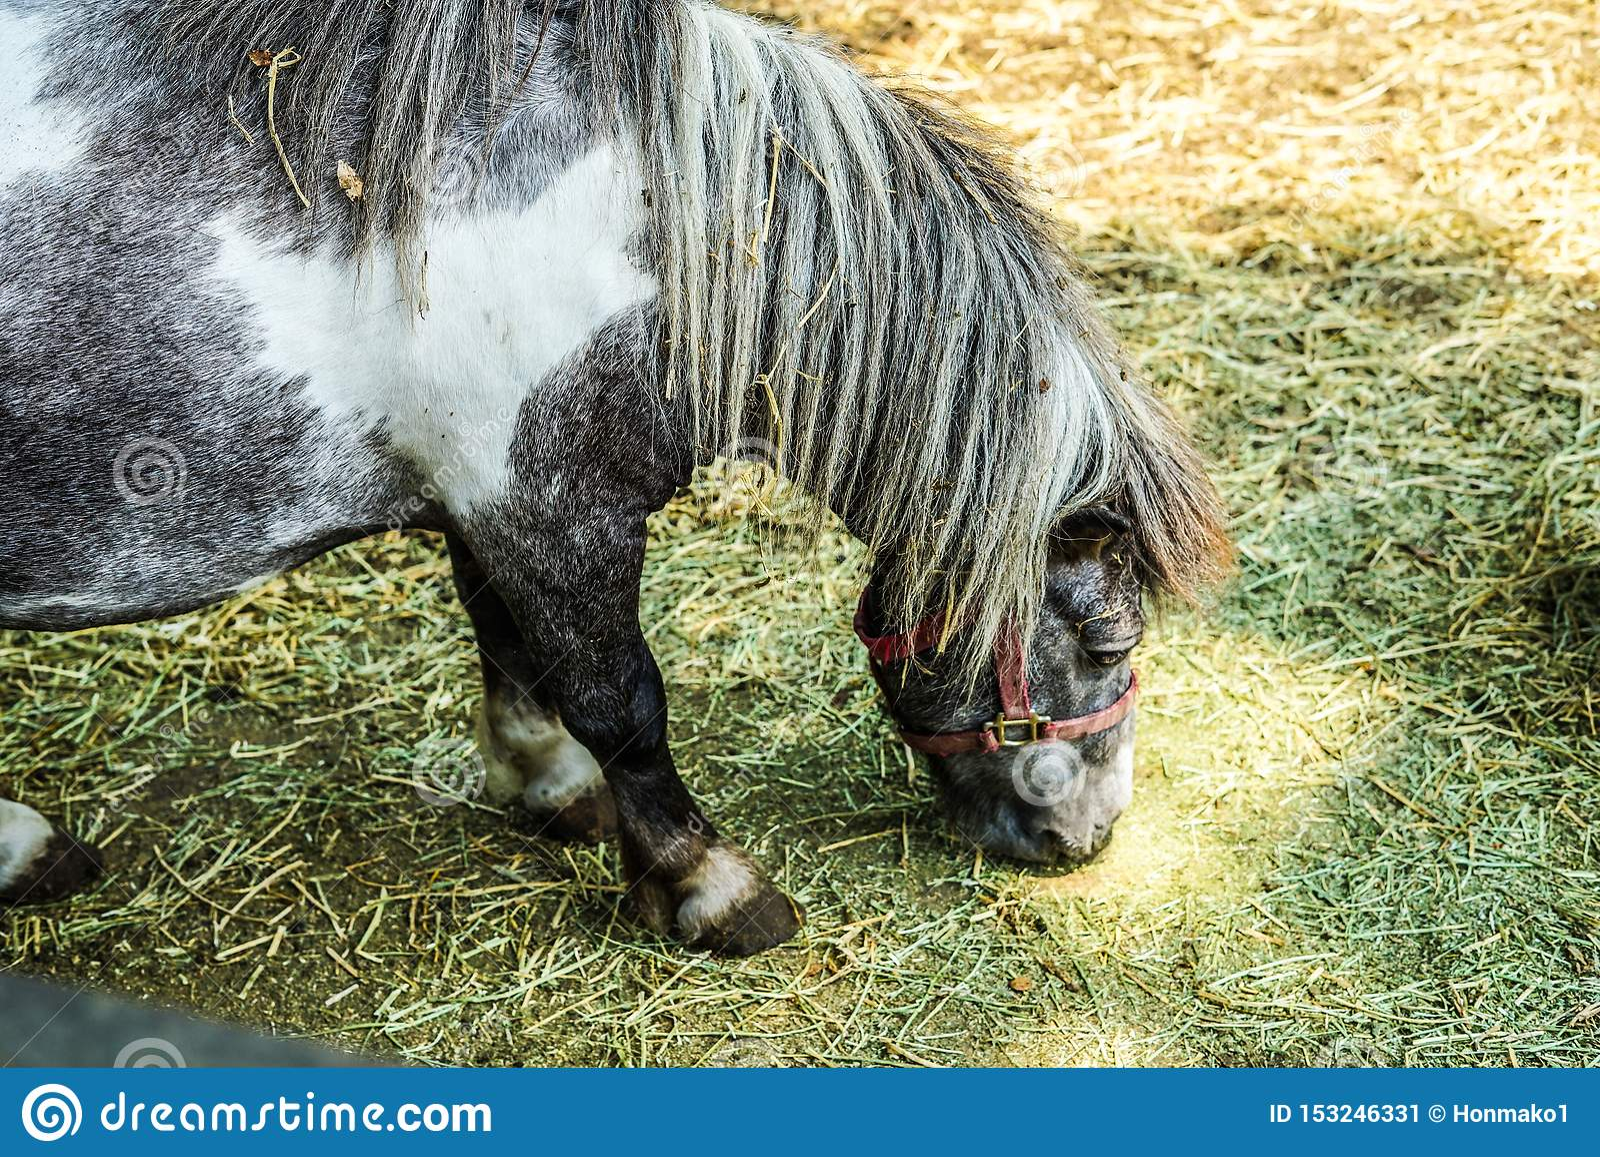 Ranch pony image